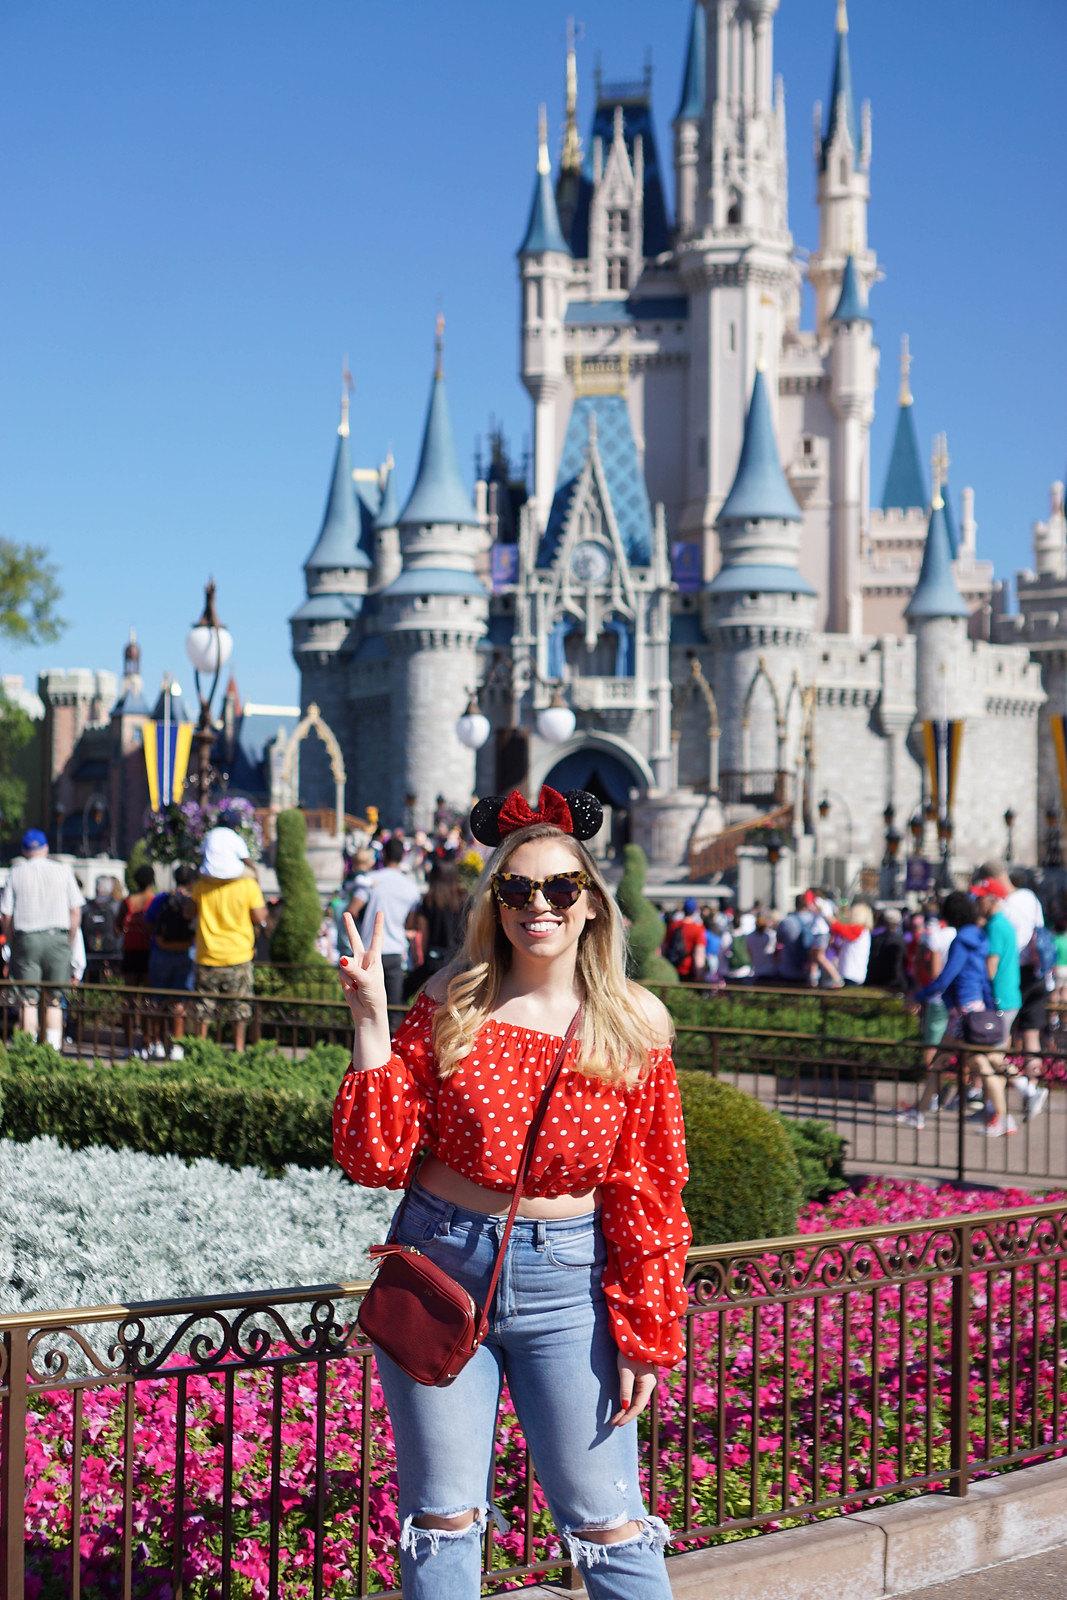 Walt Disney World Orlando Florida   Magic Kingdom   Minnie Style Red Polka Dot Top   Minnie Ears   What to Wear to Disney World   Cinderellas Castle